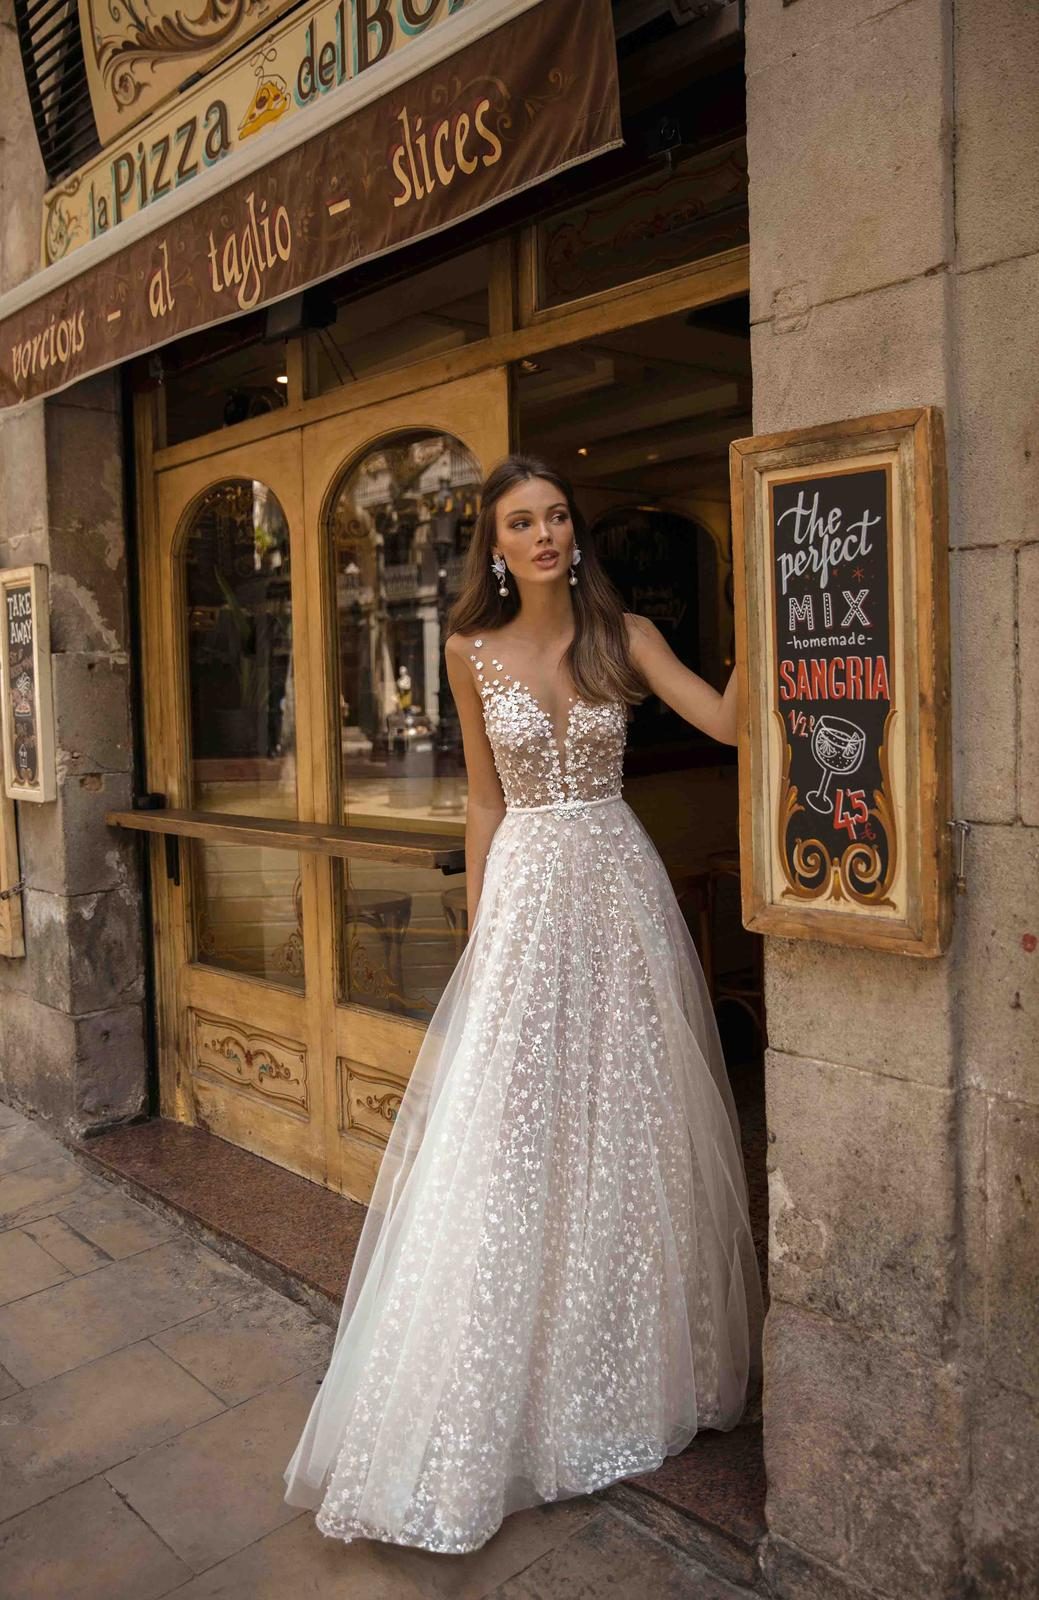 Muse by Berta * Svadobné šaty z kolekcií na rok 2019 - Obrázok č. 16